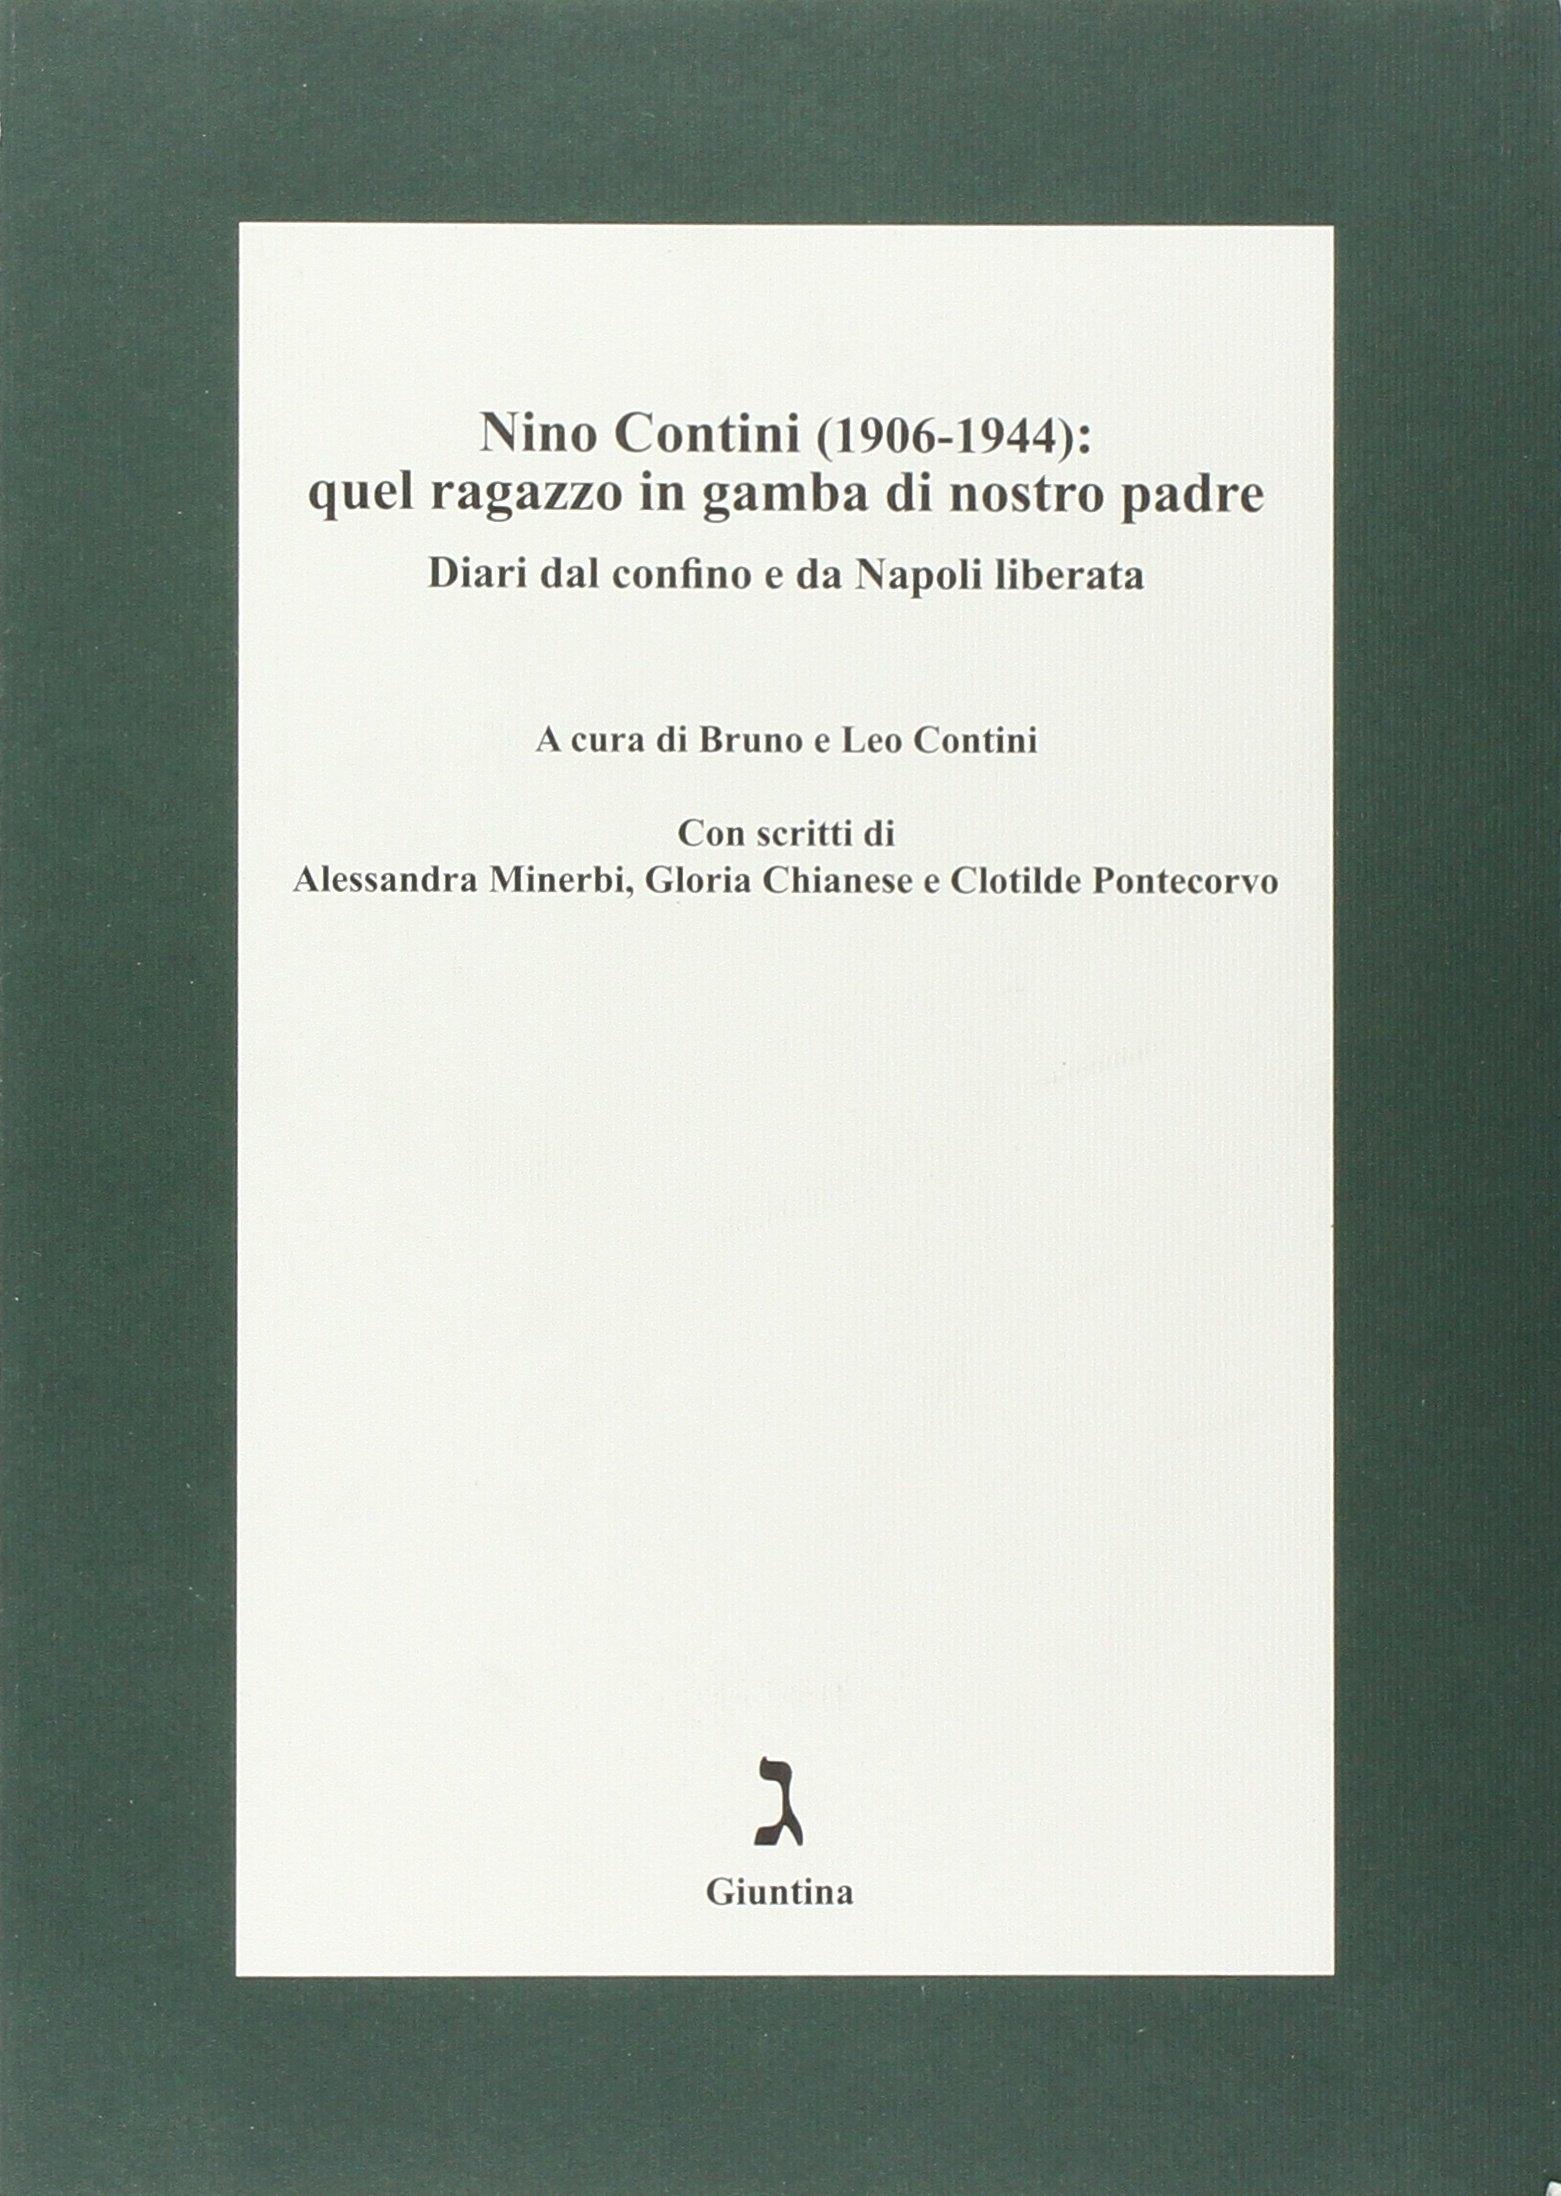 Nino Contini (1906-1944). Quel ragazzo in gamba.